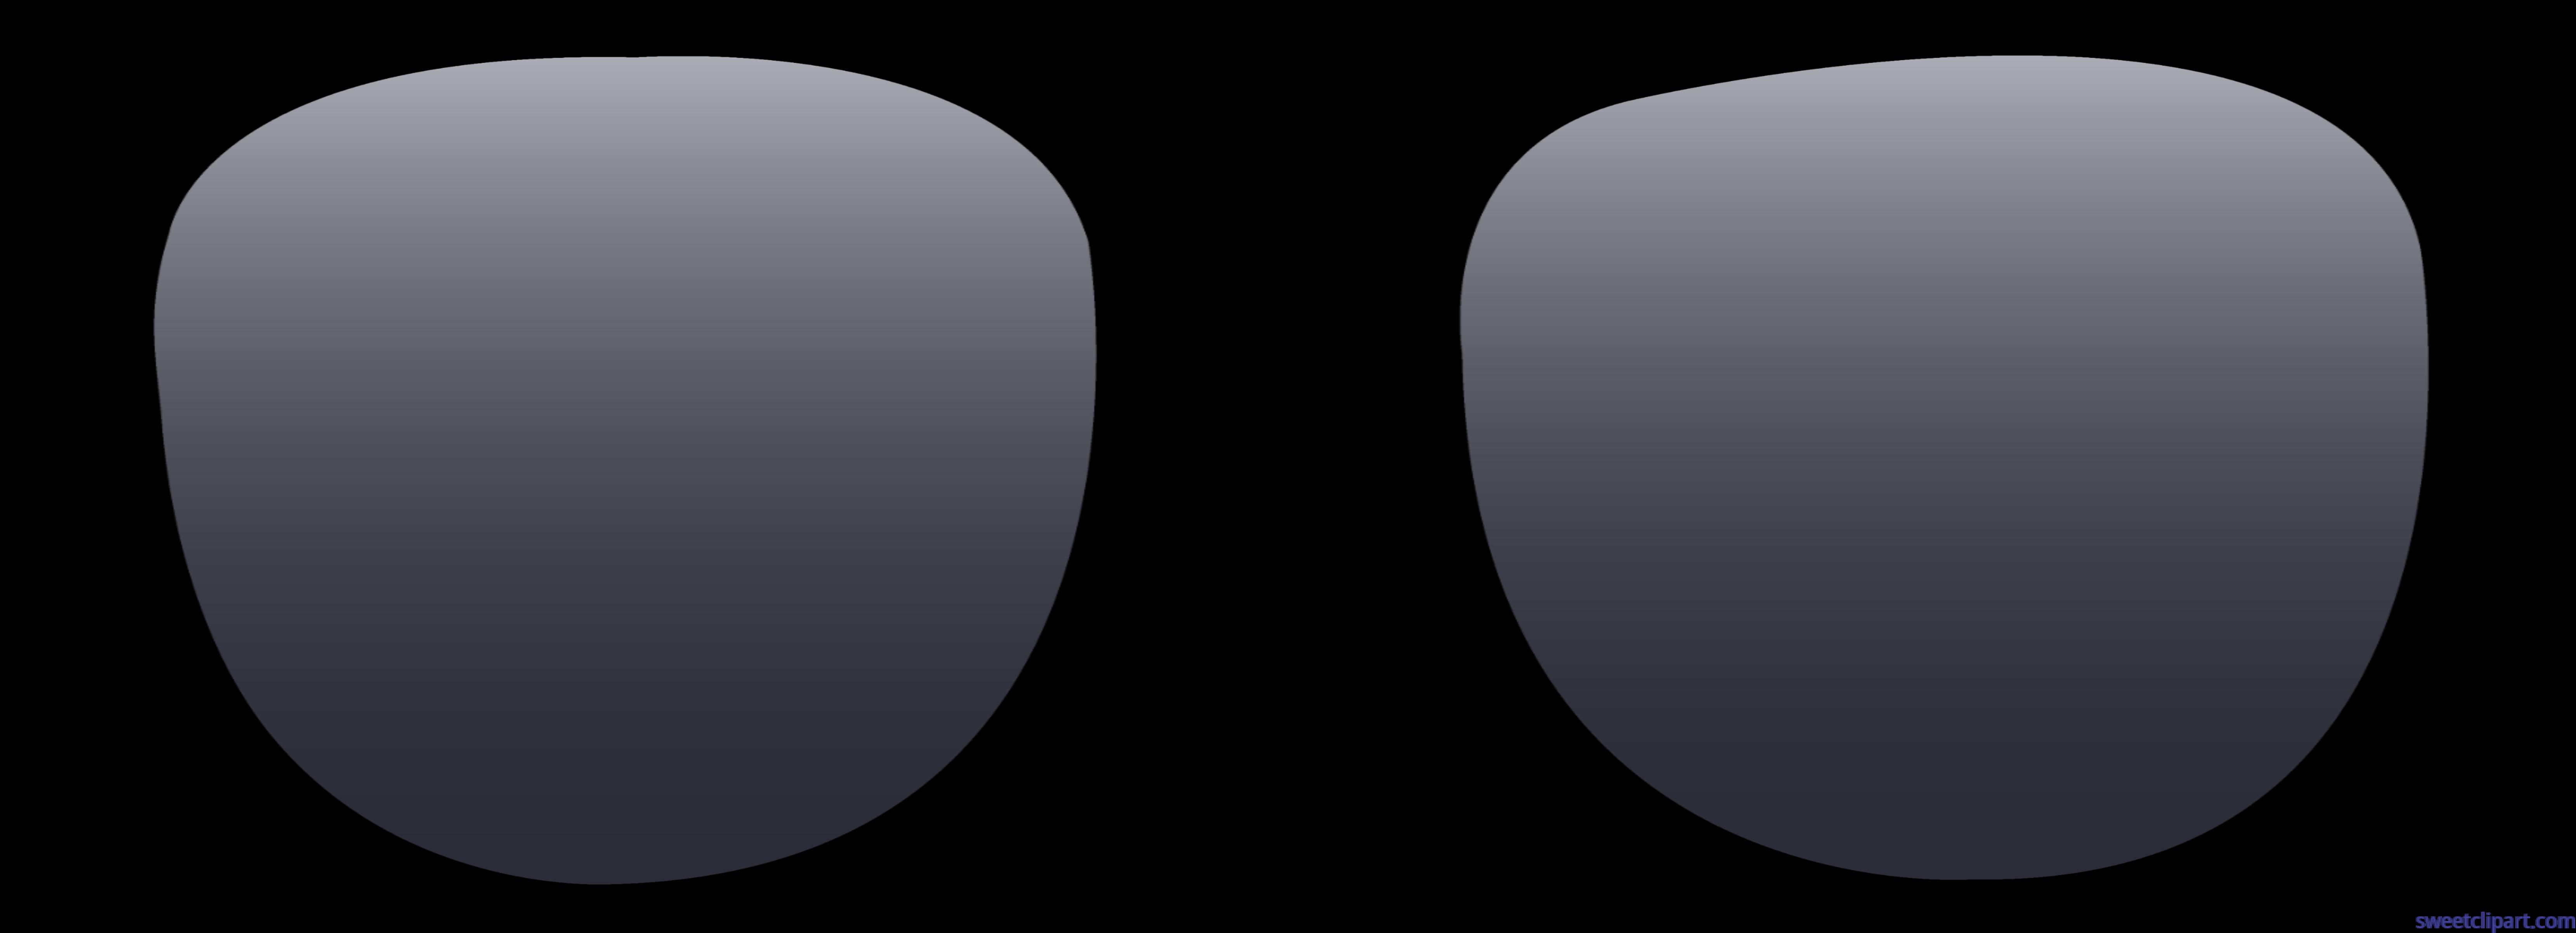 Sunglasses black clip art. Clipart hearts sunglass